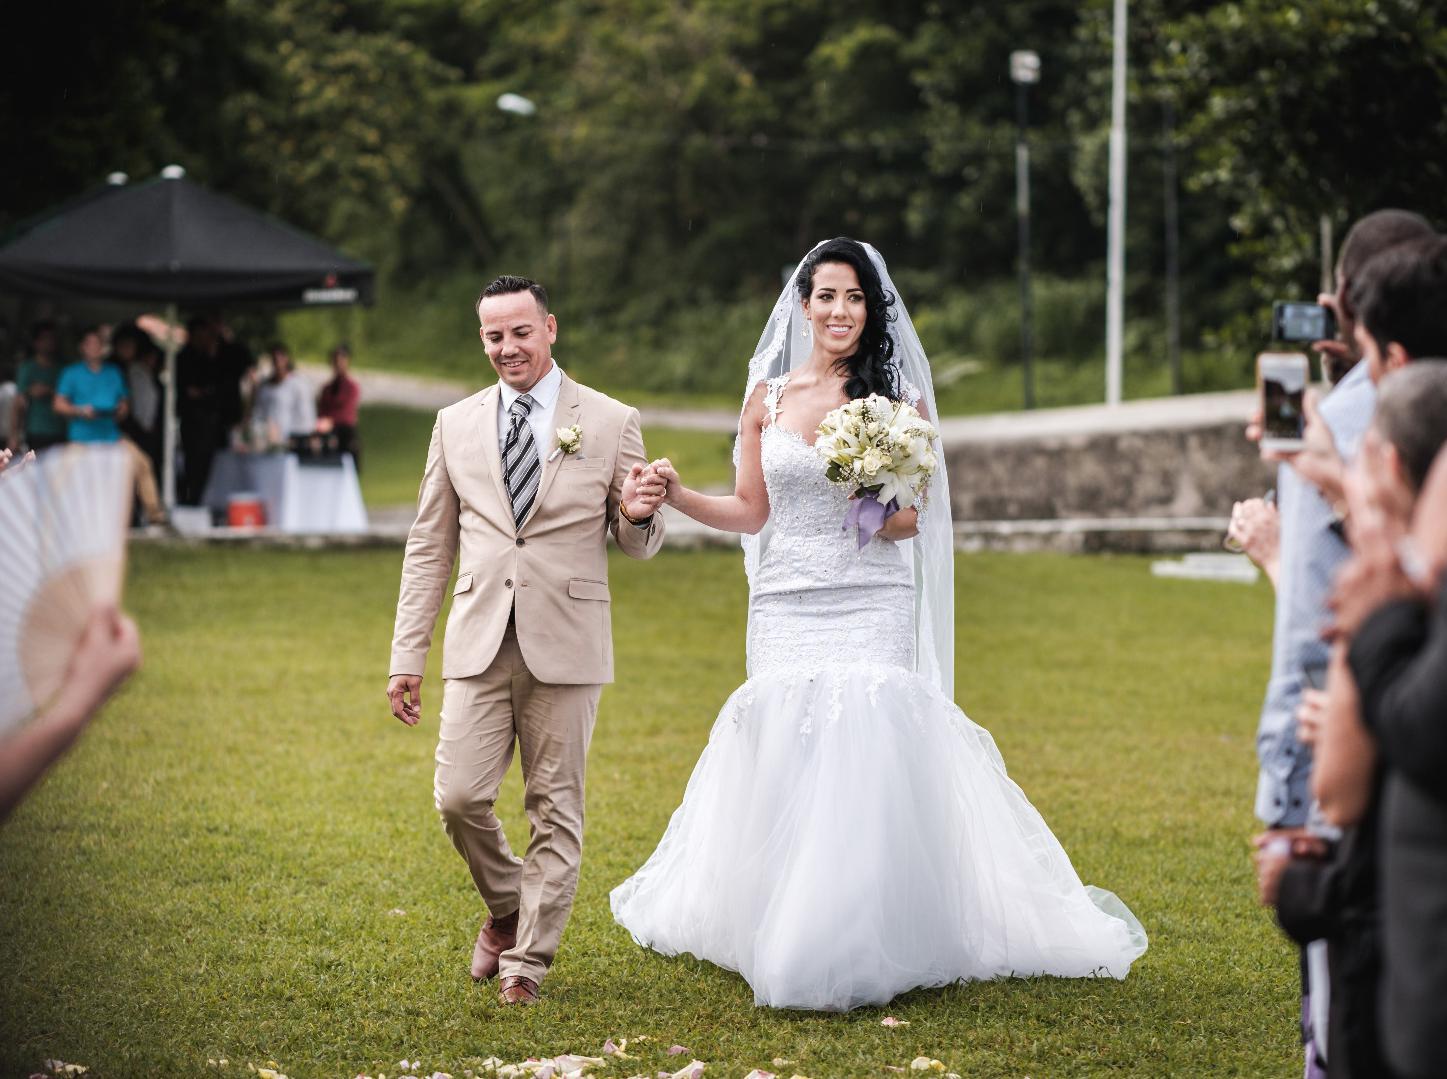 bodas-sin-clasificar-sin-tema-cuba-35562.jpg